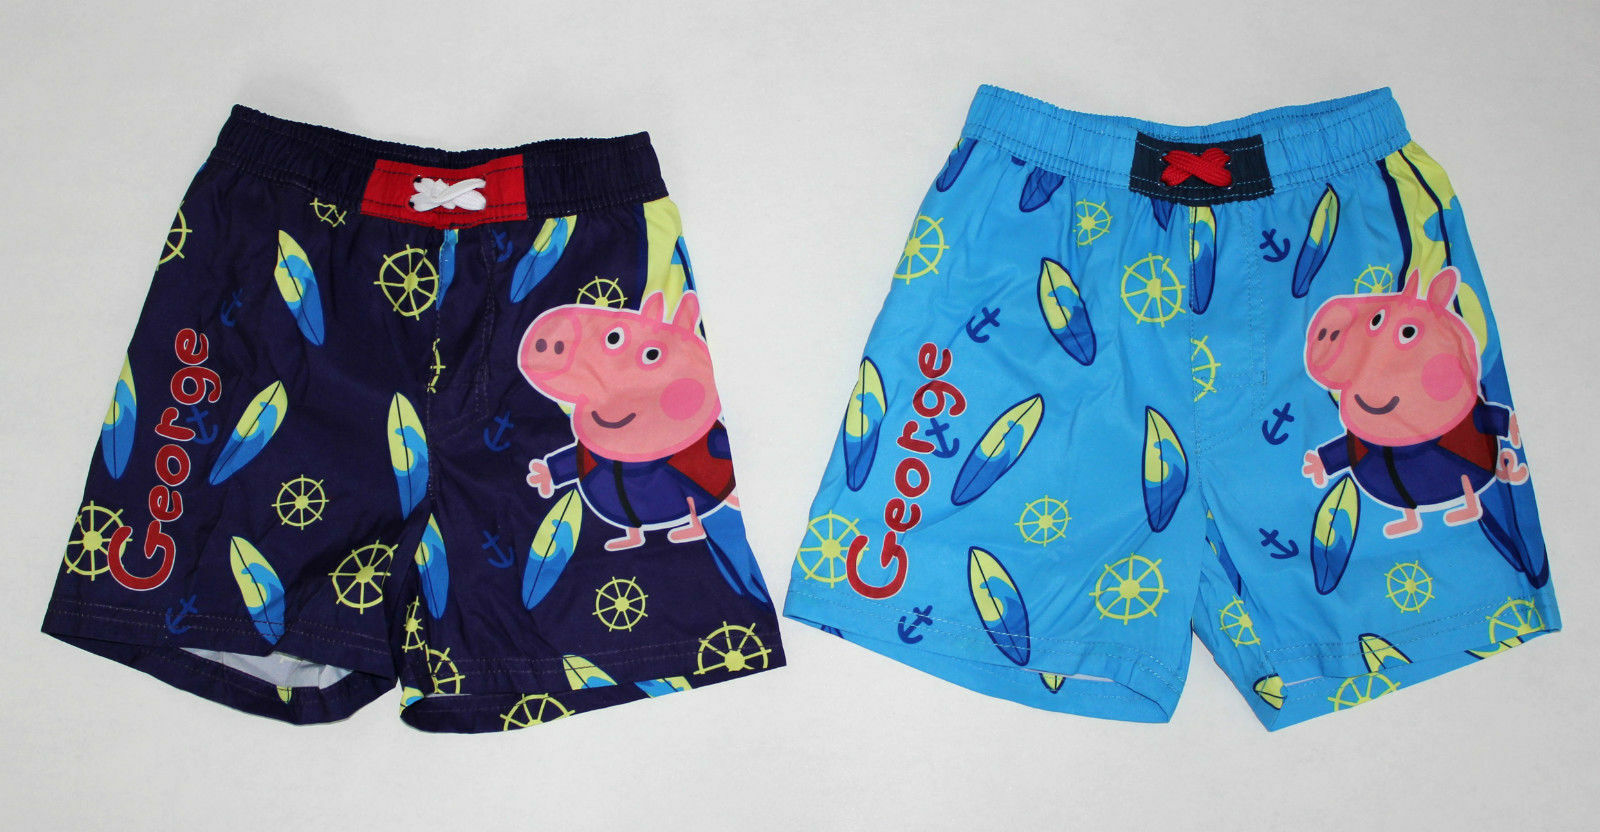 Peppa Pig Kinder Jungen Badehose Surfshorts Gr. 104-128,Badeshorts neu!